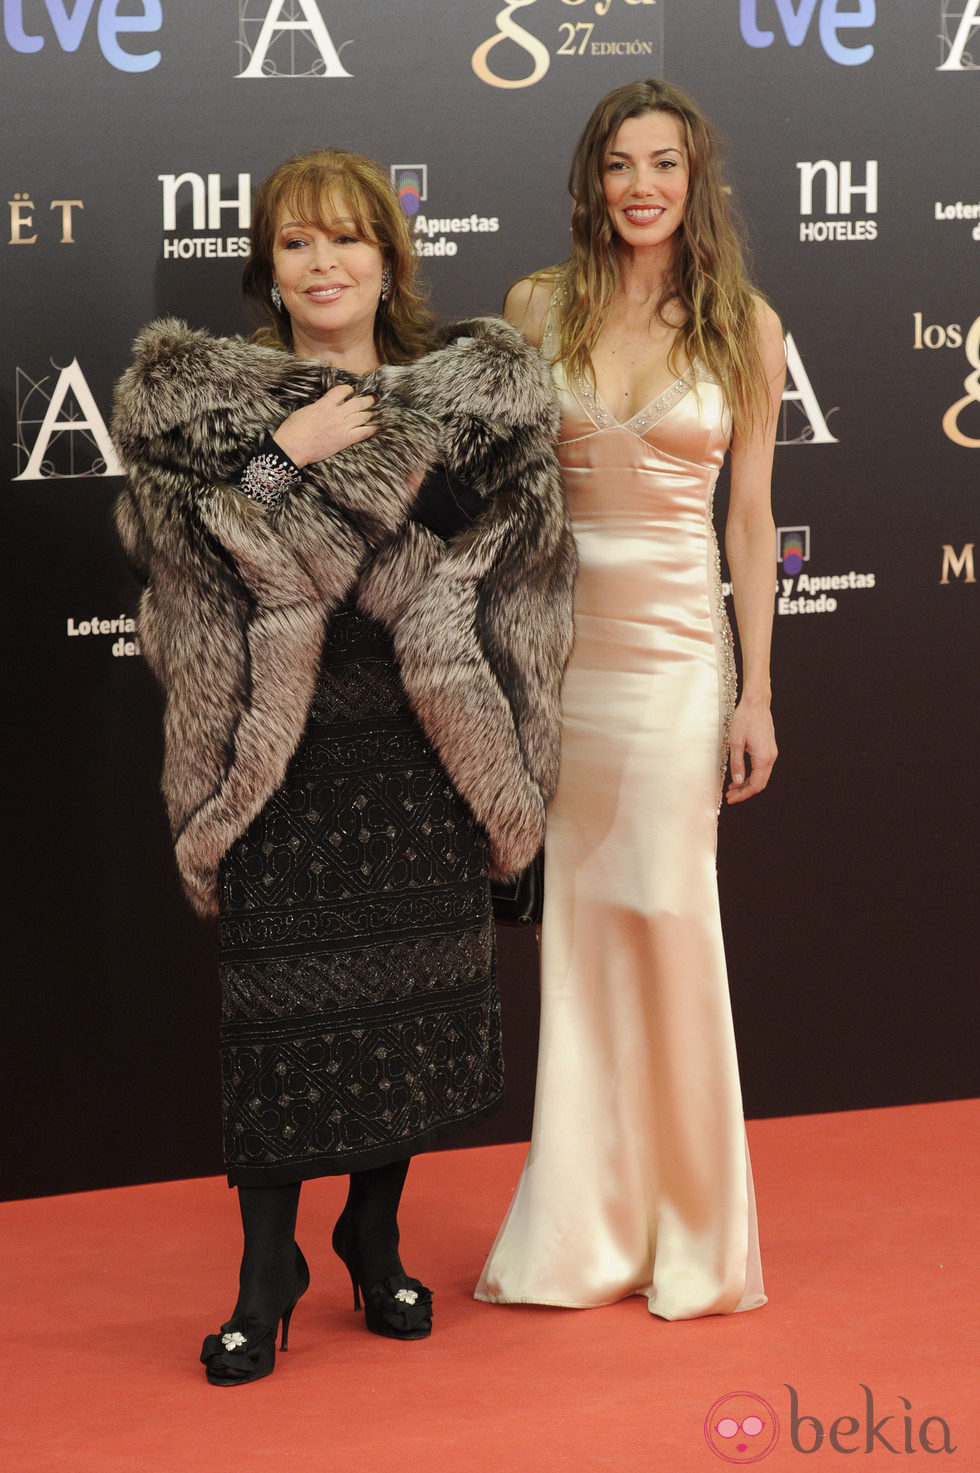 Massiel en la alfombra roja de los Goya 2013